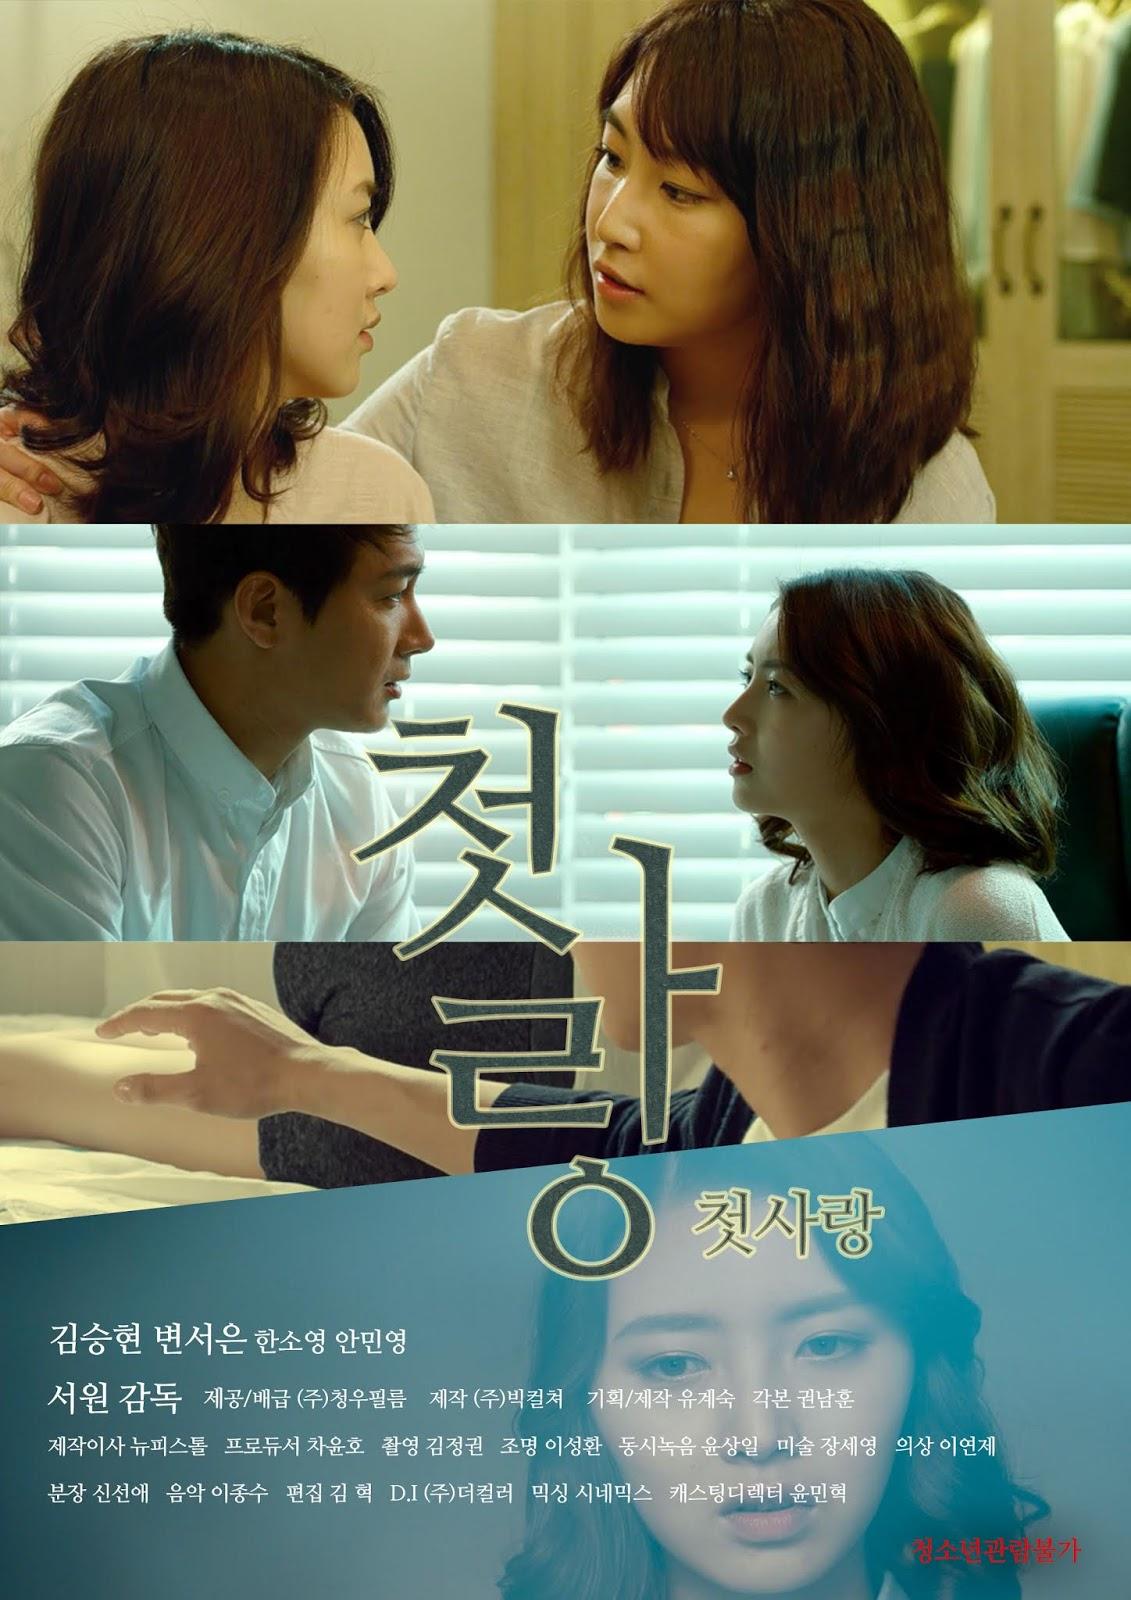 First Love Full Korea 18+ Adult Movie Online Free